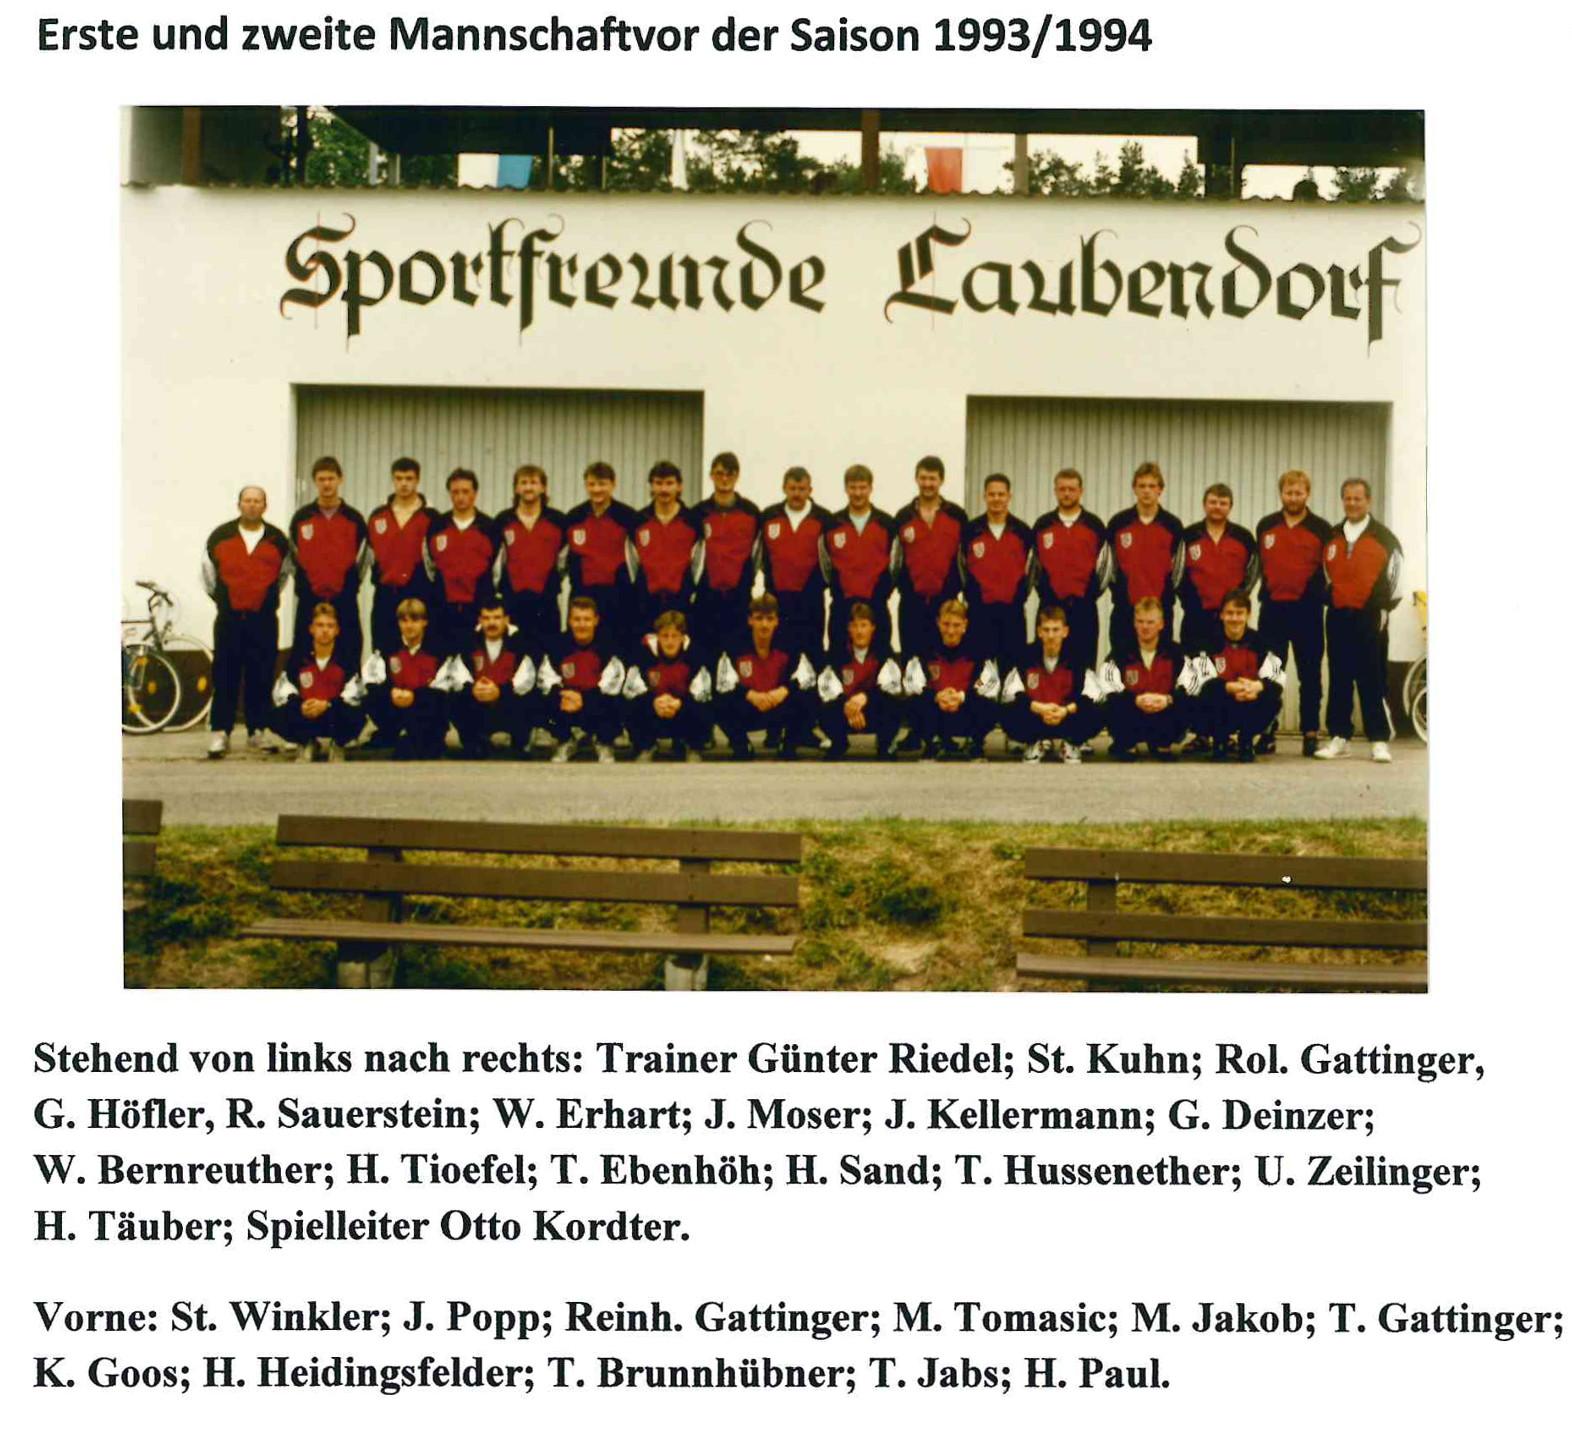 sfl-91-94-a25a-herren12-1993